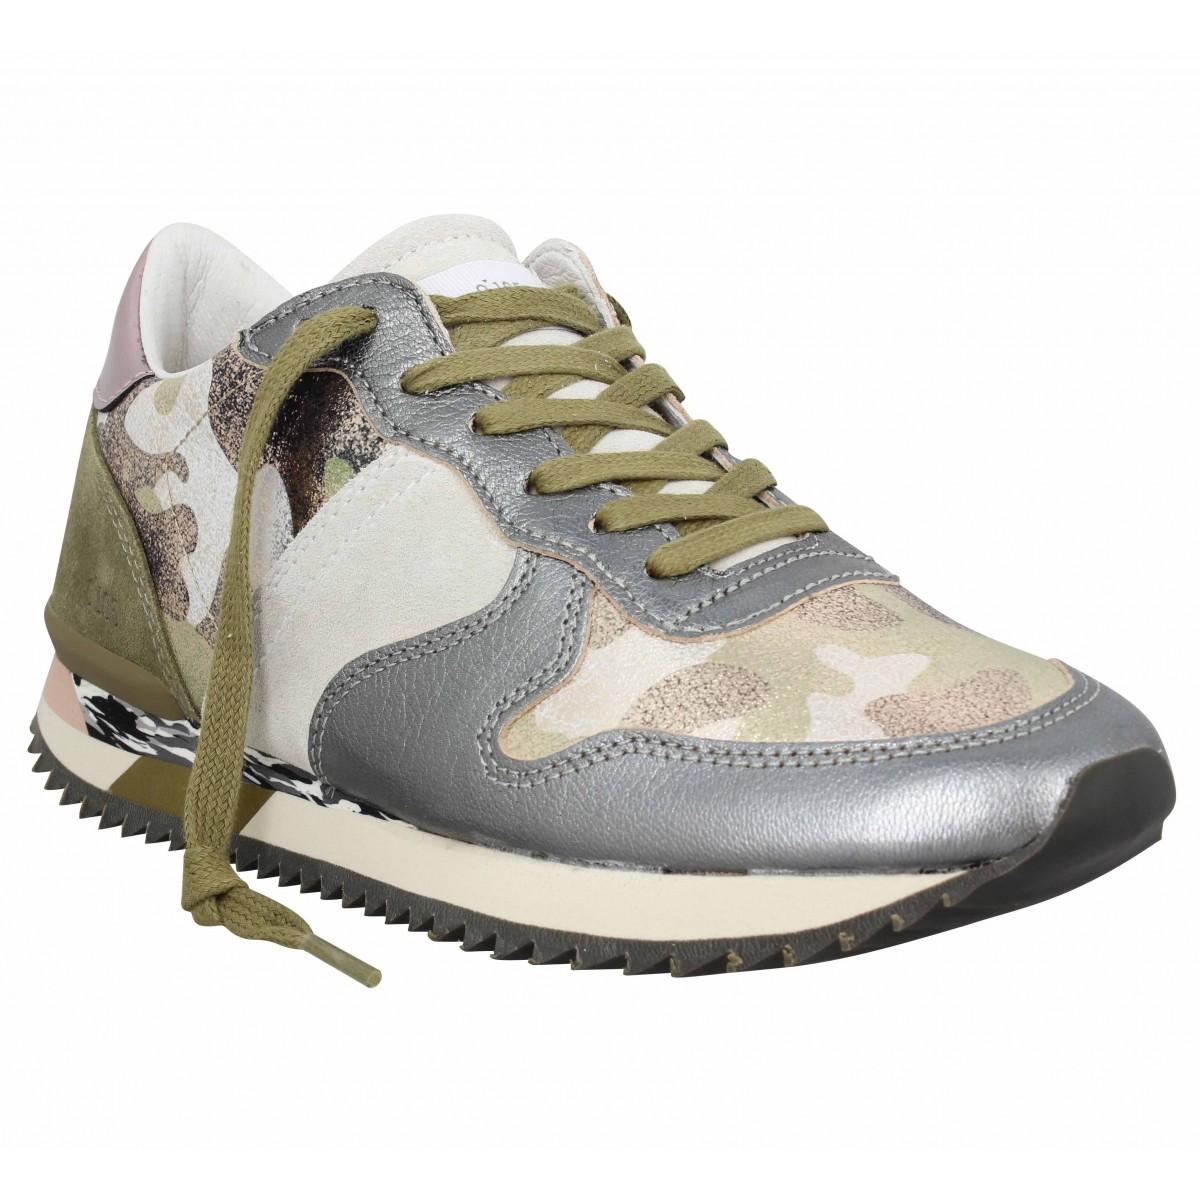 S Camo Chaussures Cuir 105 0 Run Femme Fanny wxE81vEPqn